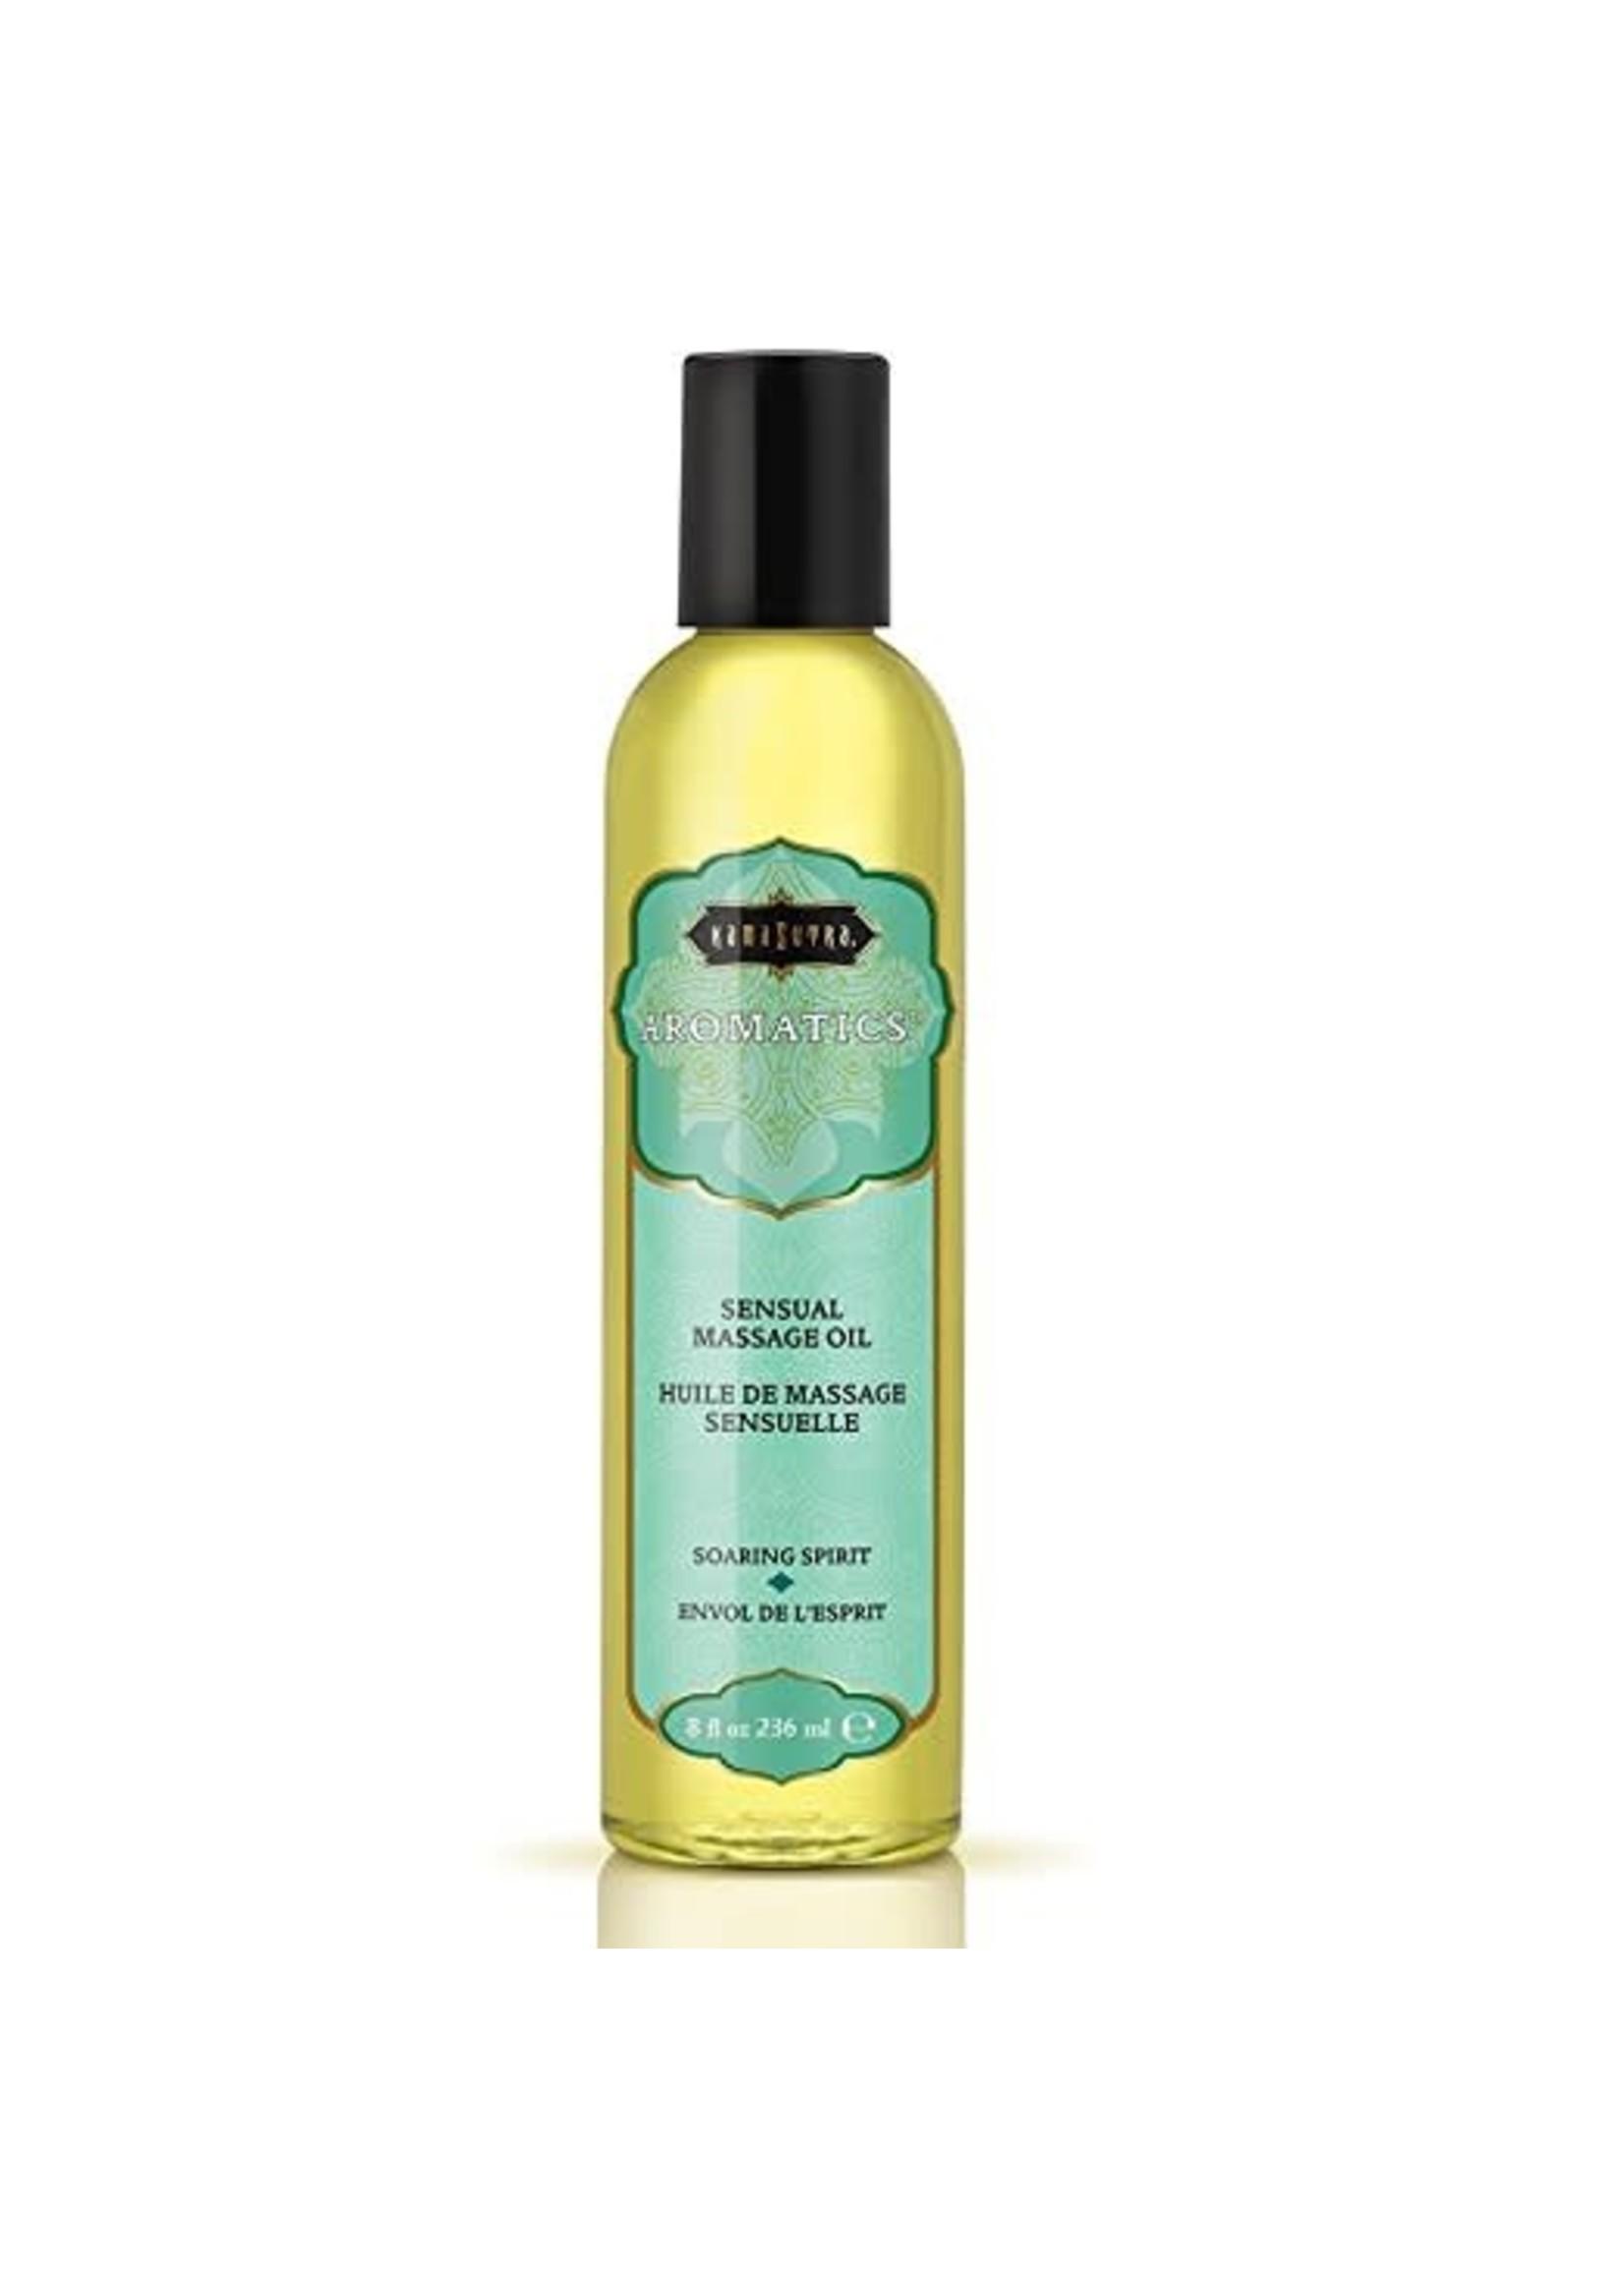 Kama Sutra Aromatics Massage Oil Soaring Spirit 8fl oz